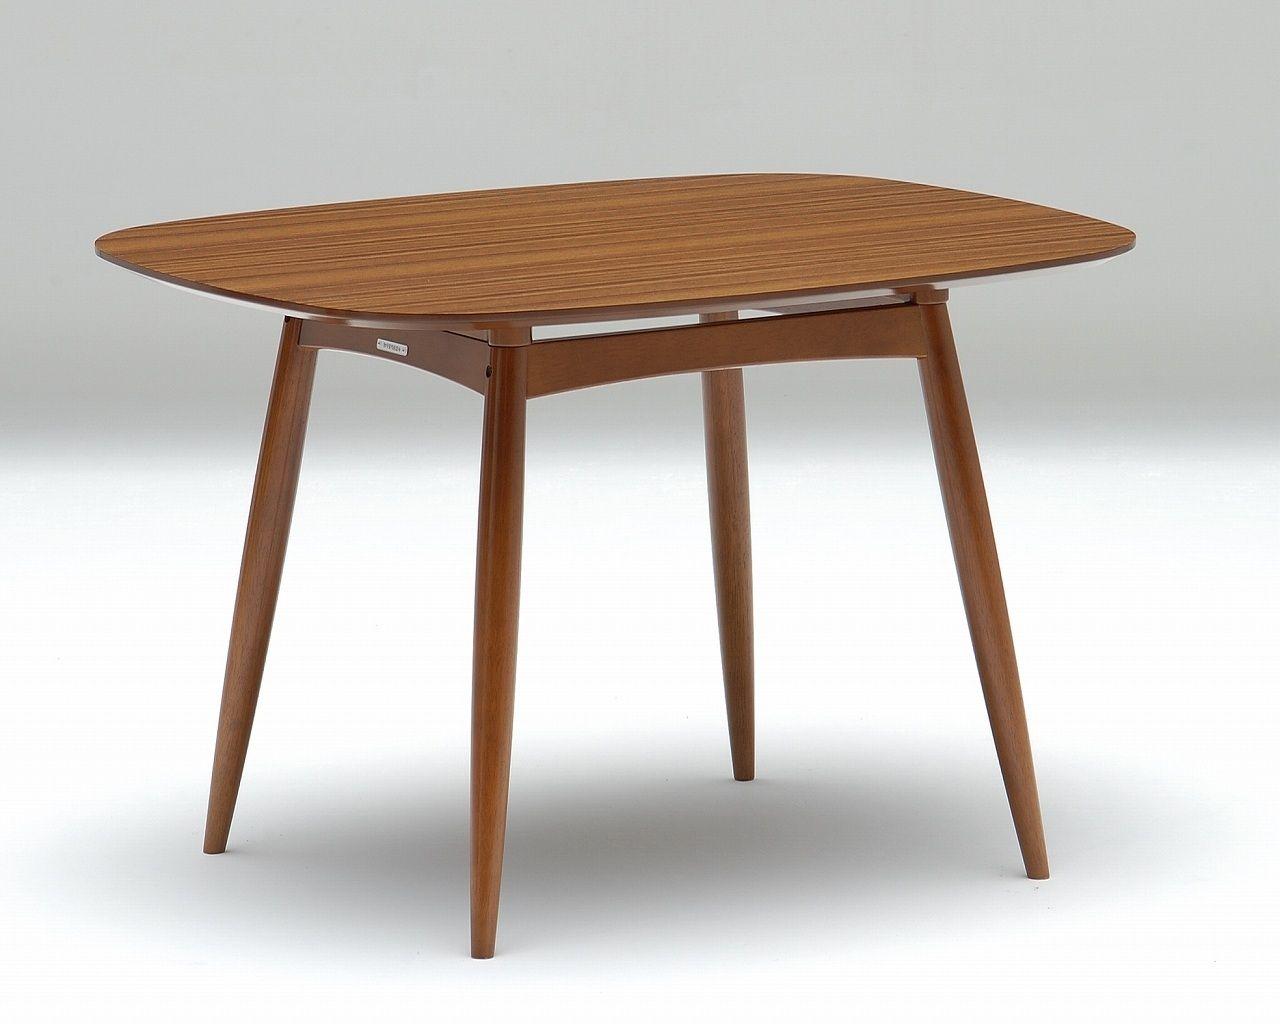 Mesa de comedor clásica / de roble / rectangular / ajustable en ...